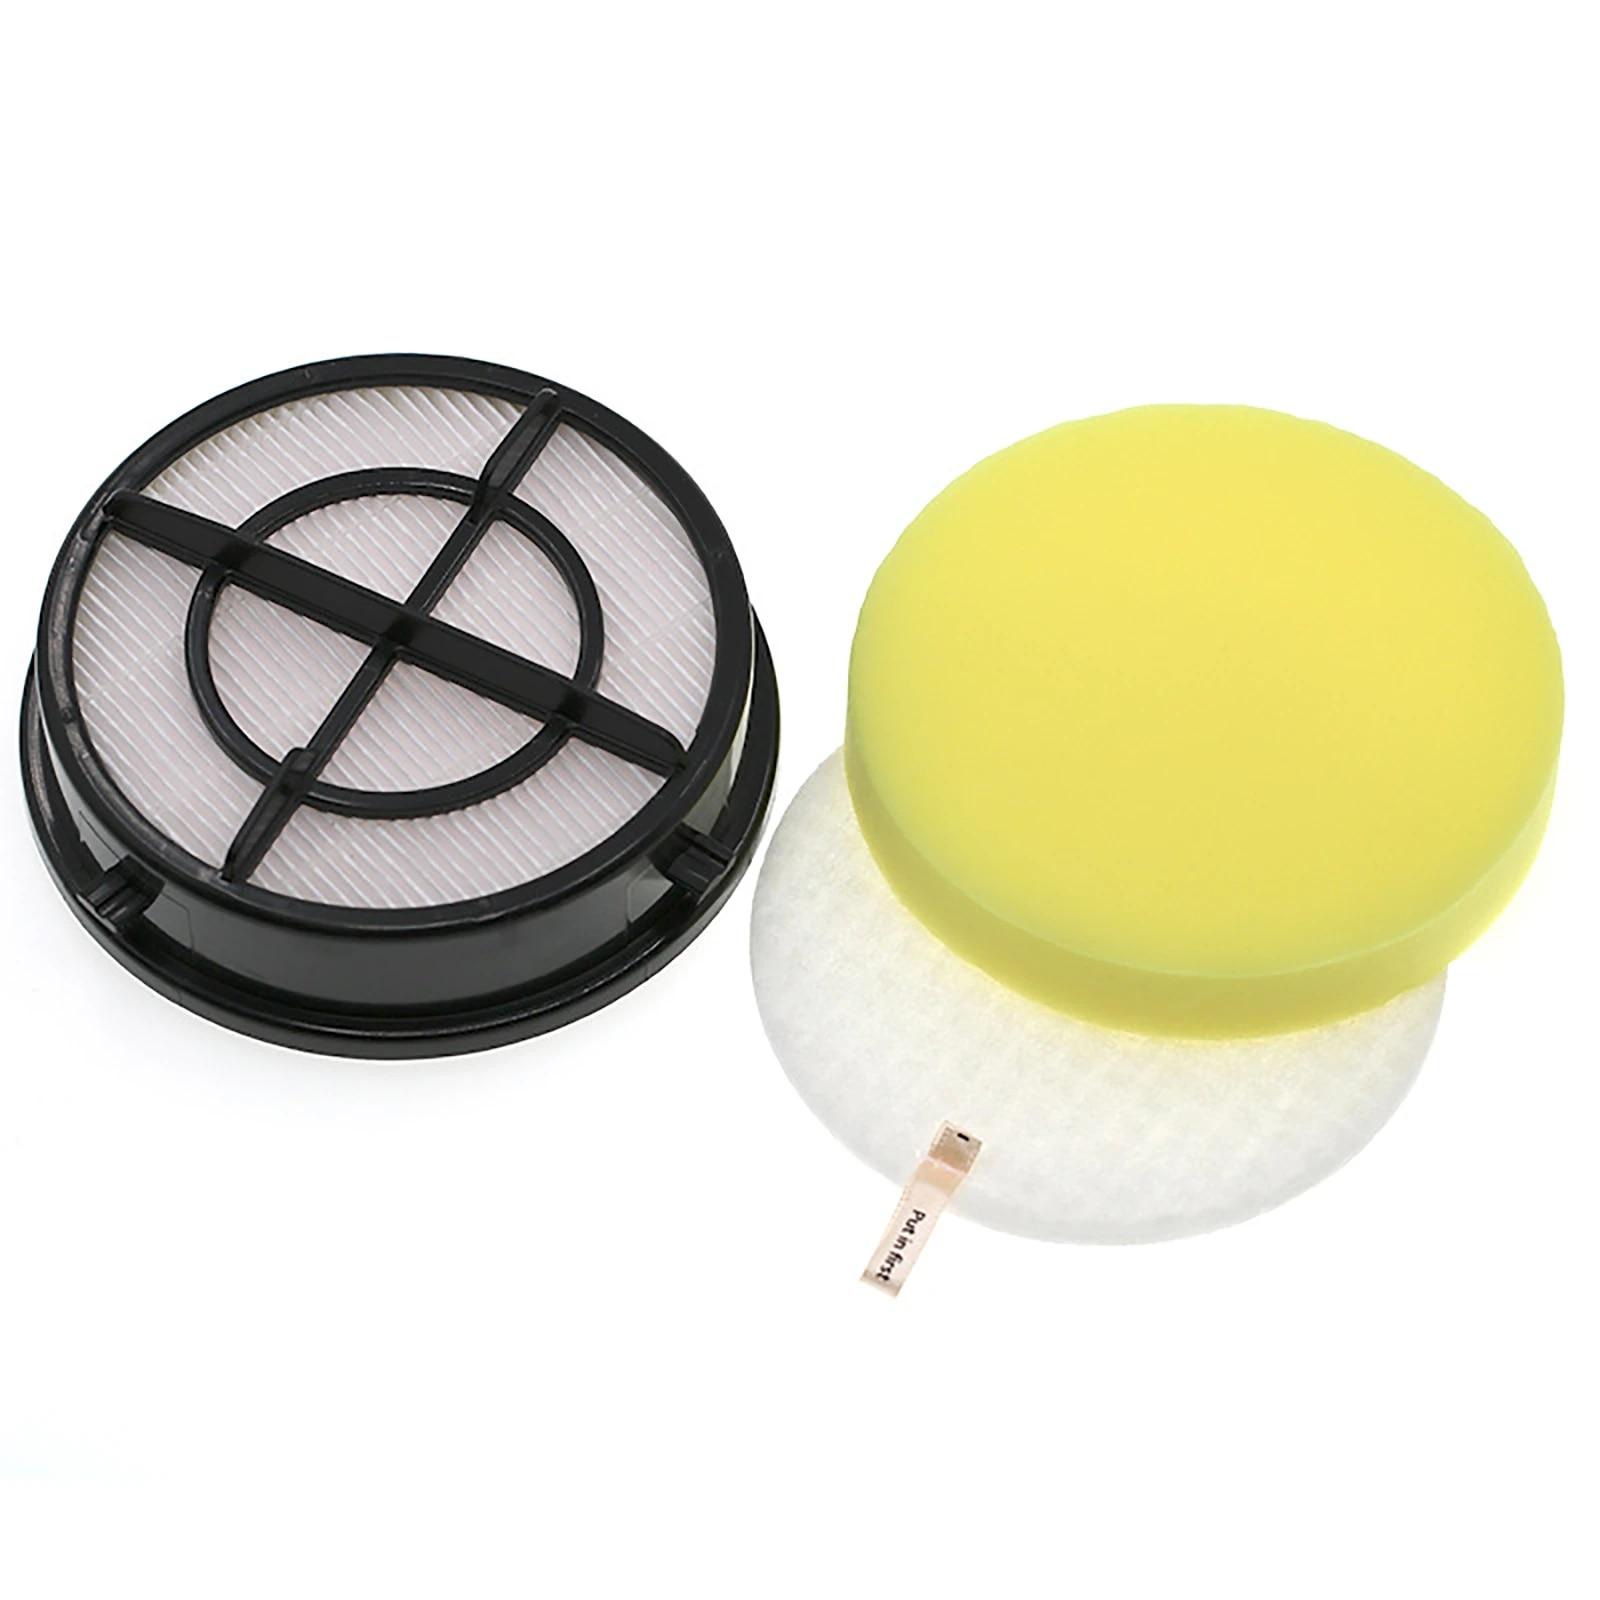 HEPA Filter Set for Bissell Pet Hair Eraser Upright 16871 1687 16501 1650a 1650P